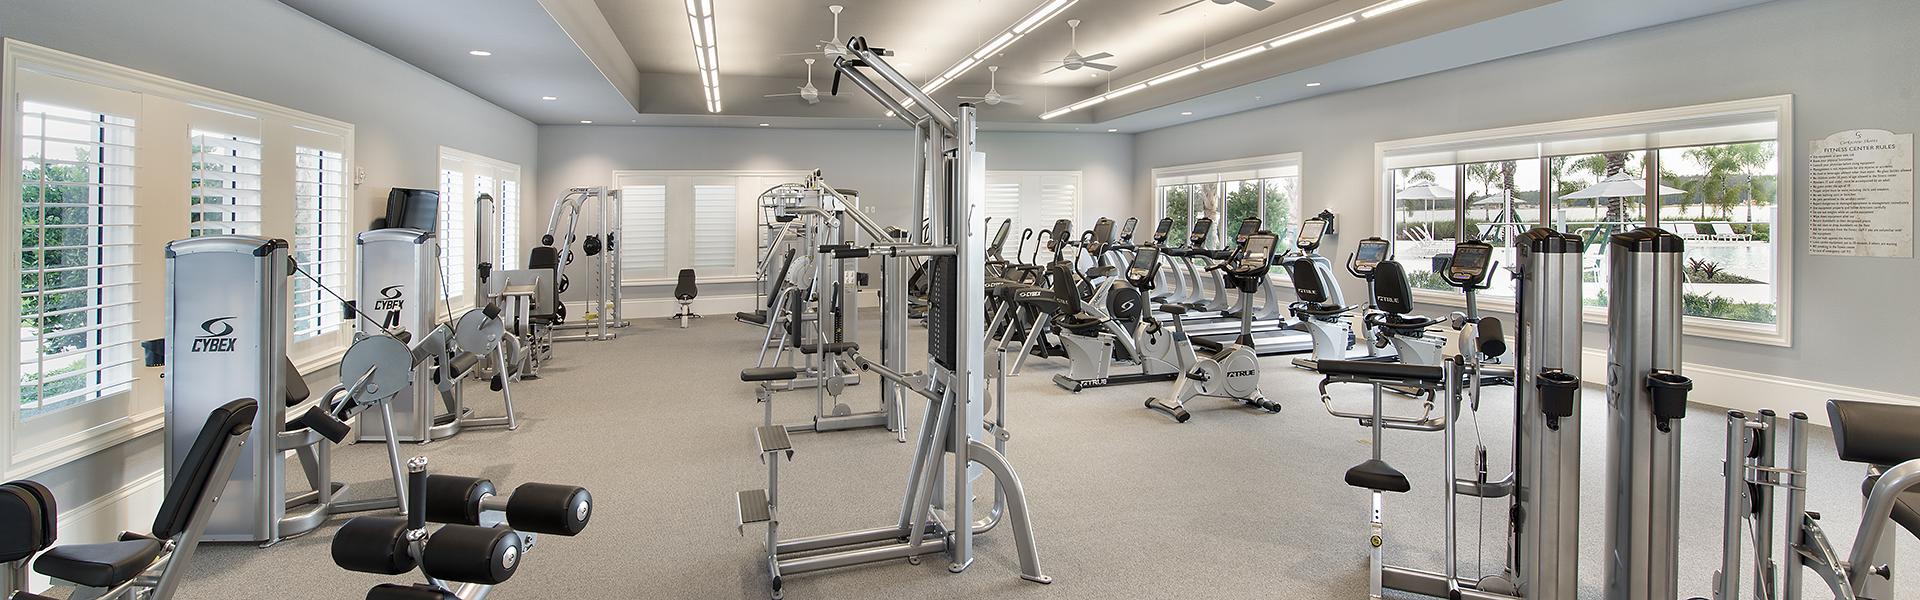 10-Fitness-1